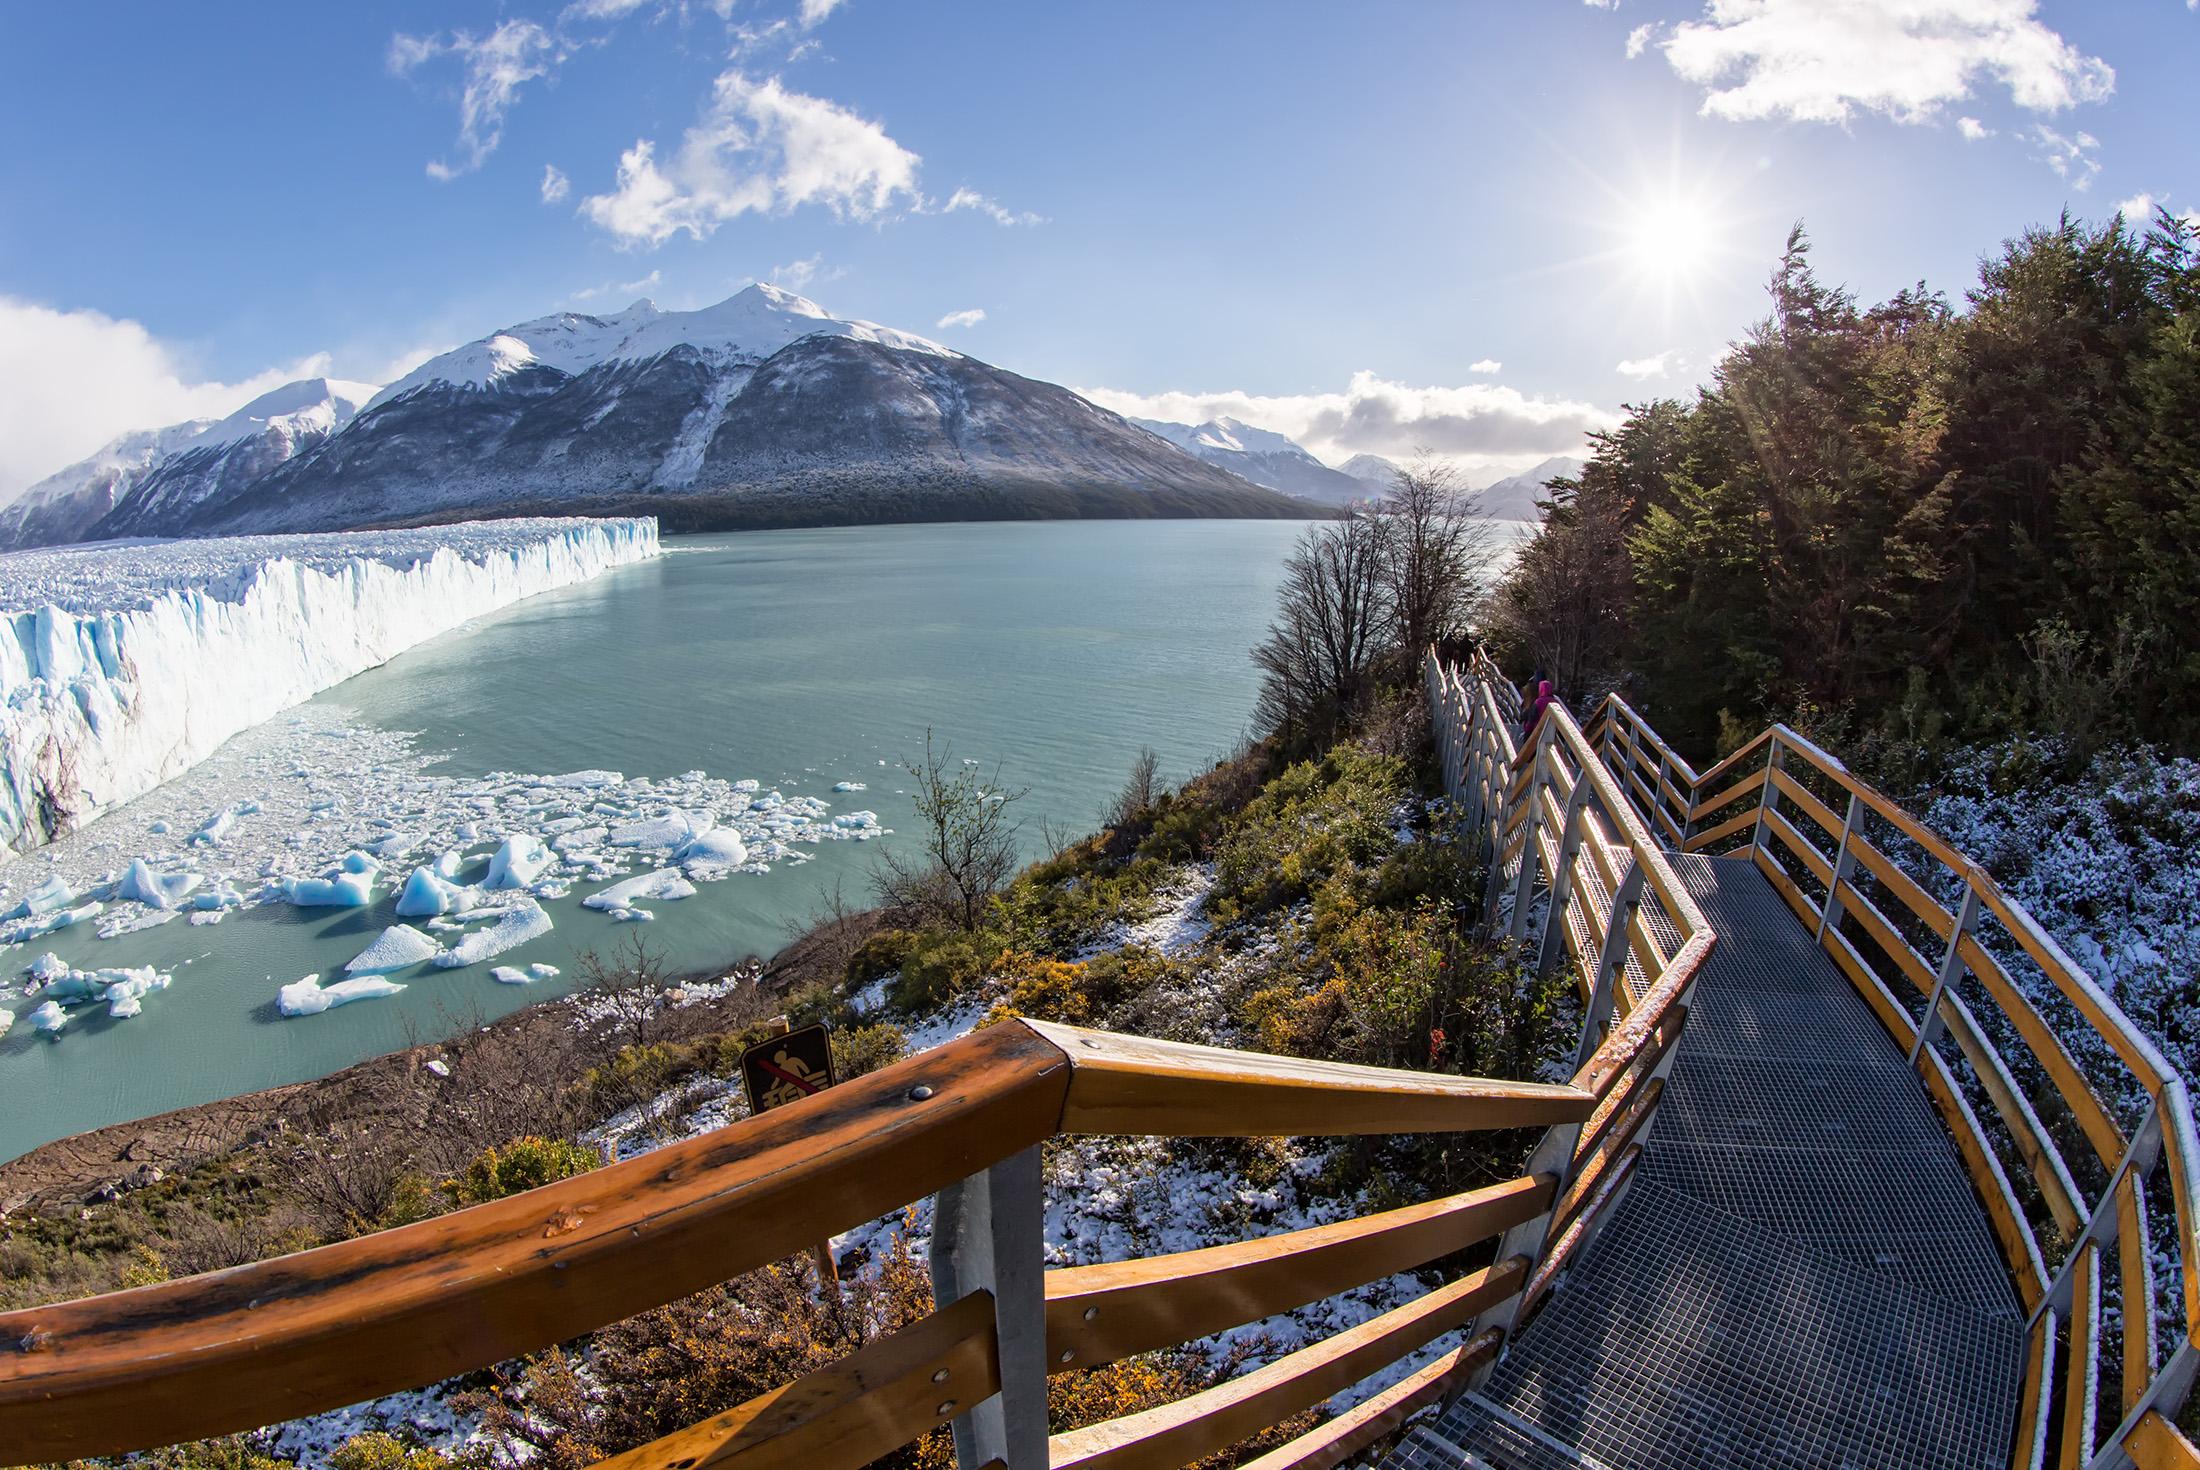 Perito Moreno Glacier Experience - Independent 1